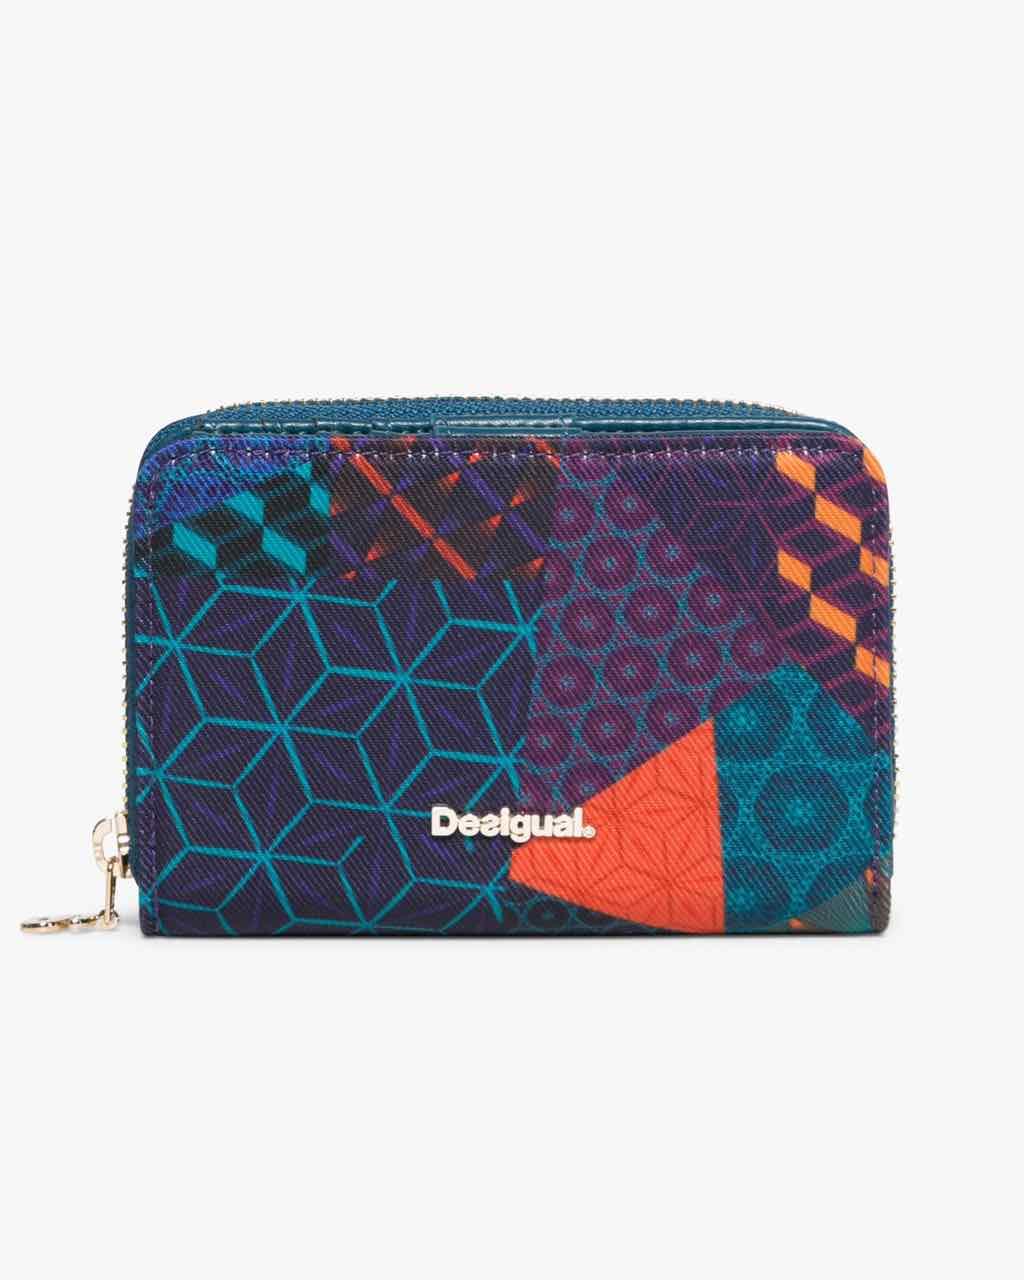 17WAYPGB_3094 Desigual Wallet Magnetic Erika Buy Online